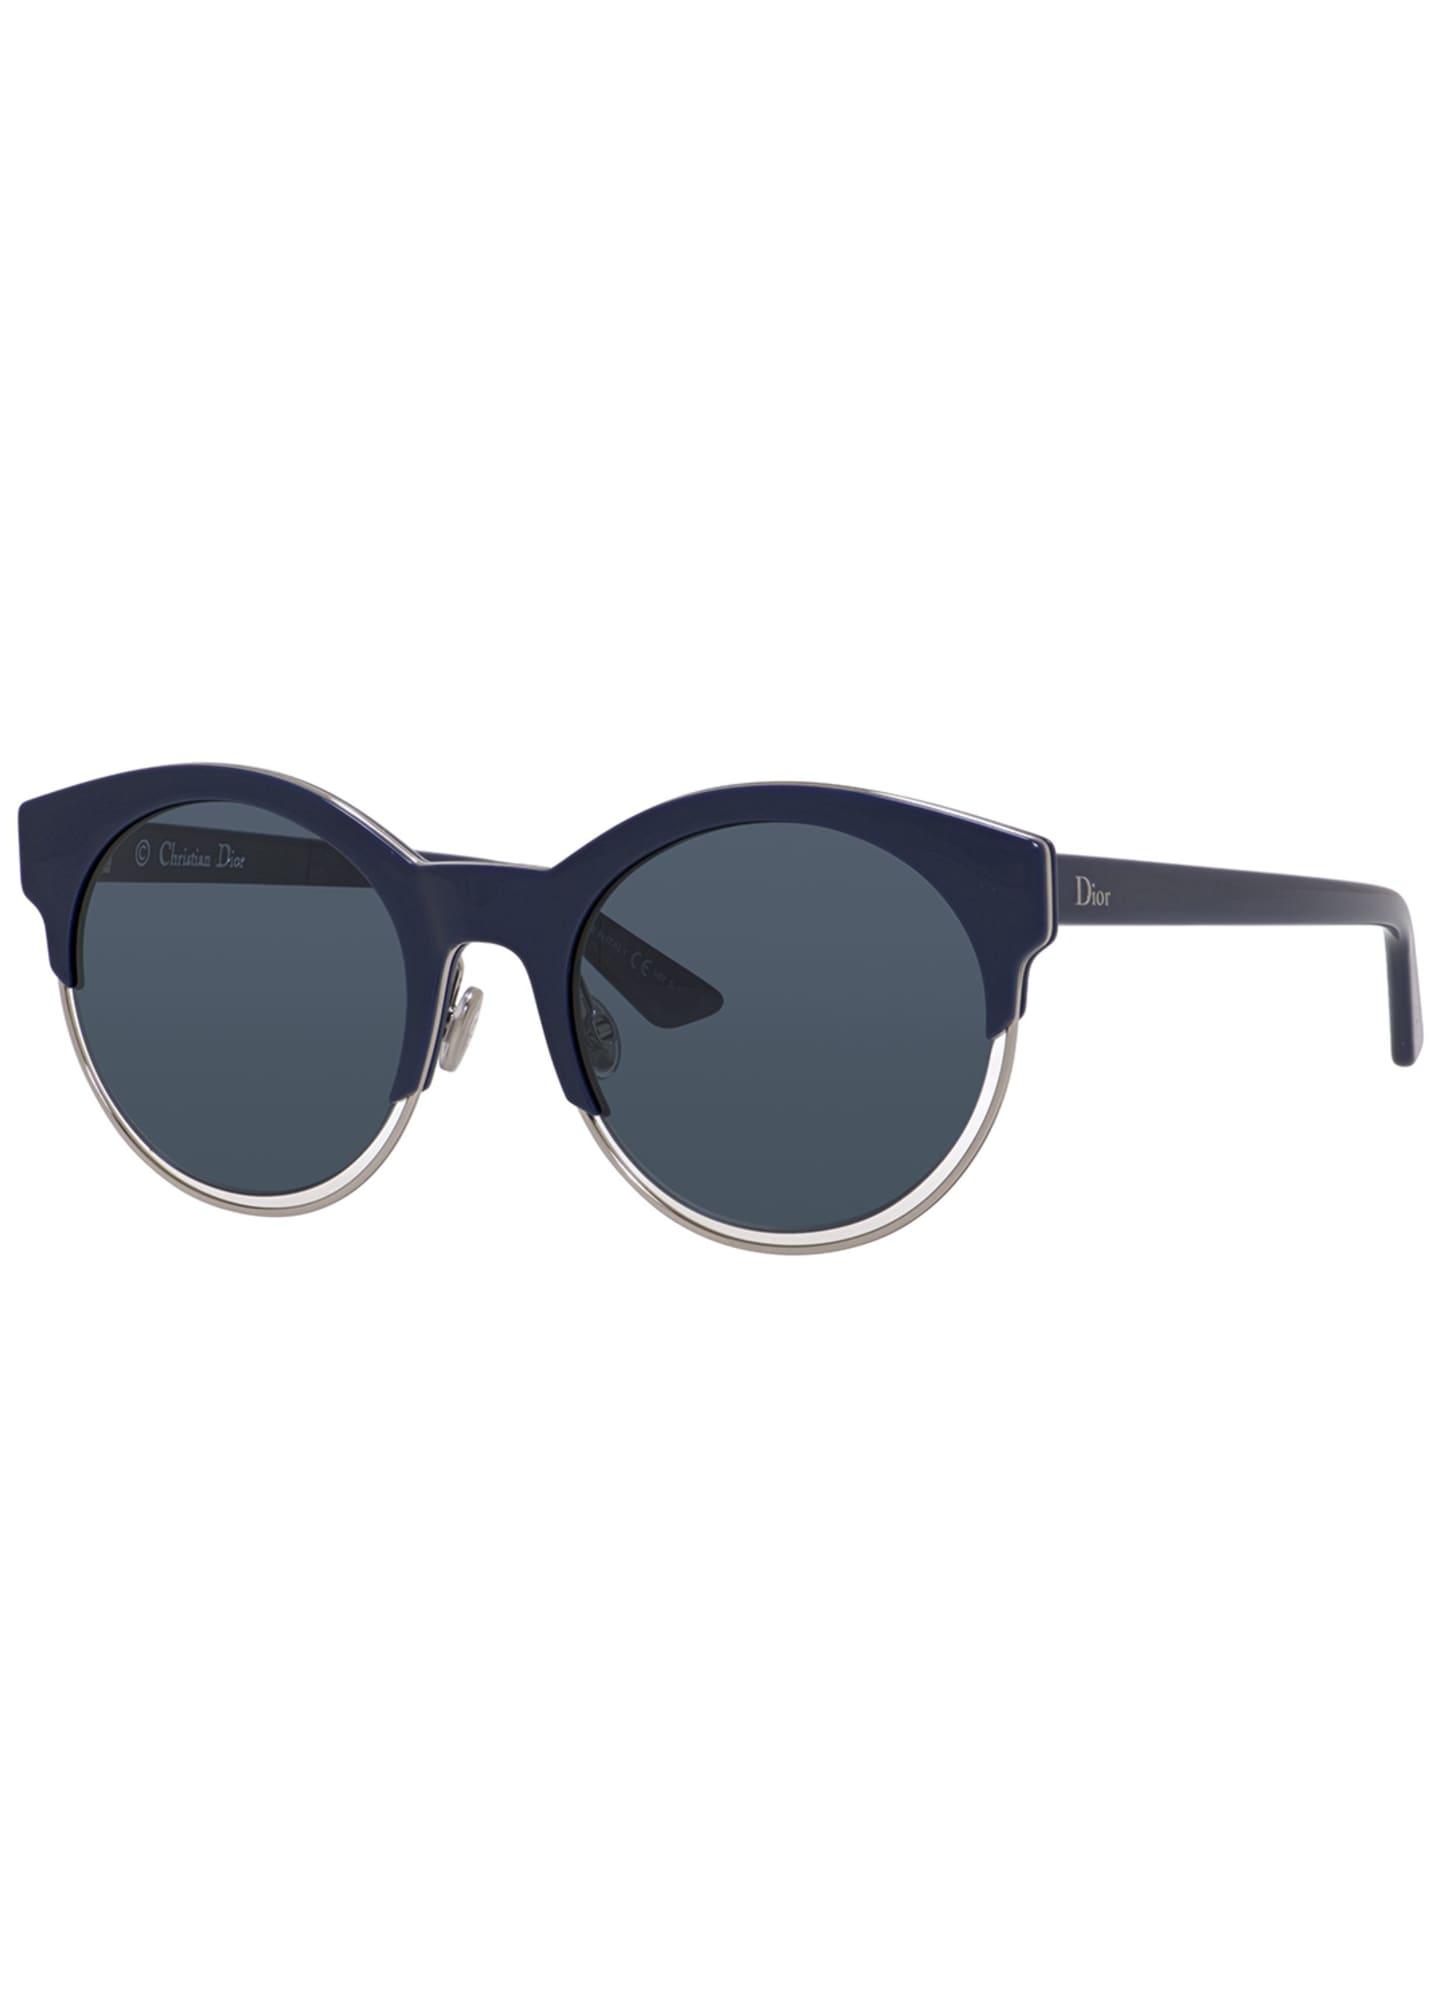 Dior Sideral 1 Cat-Eye Sunglasses